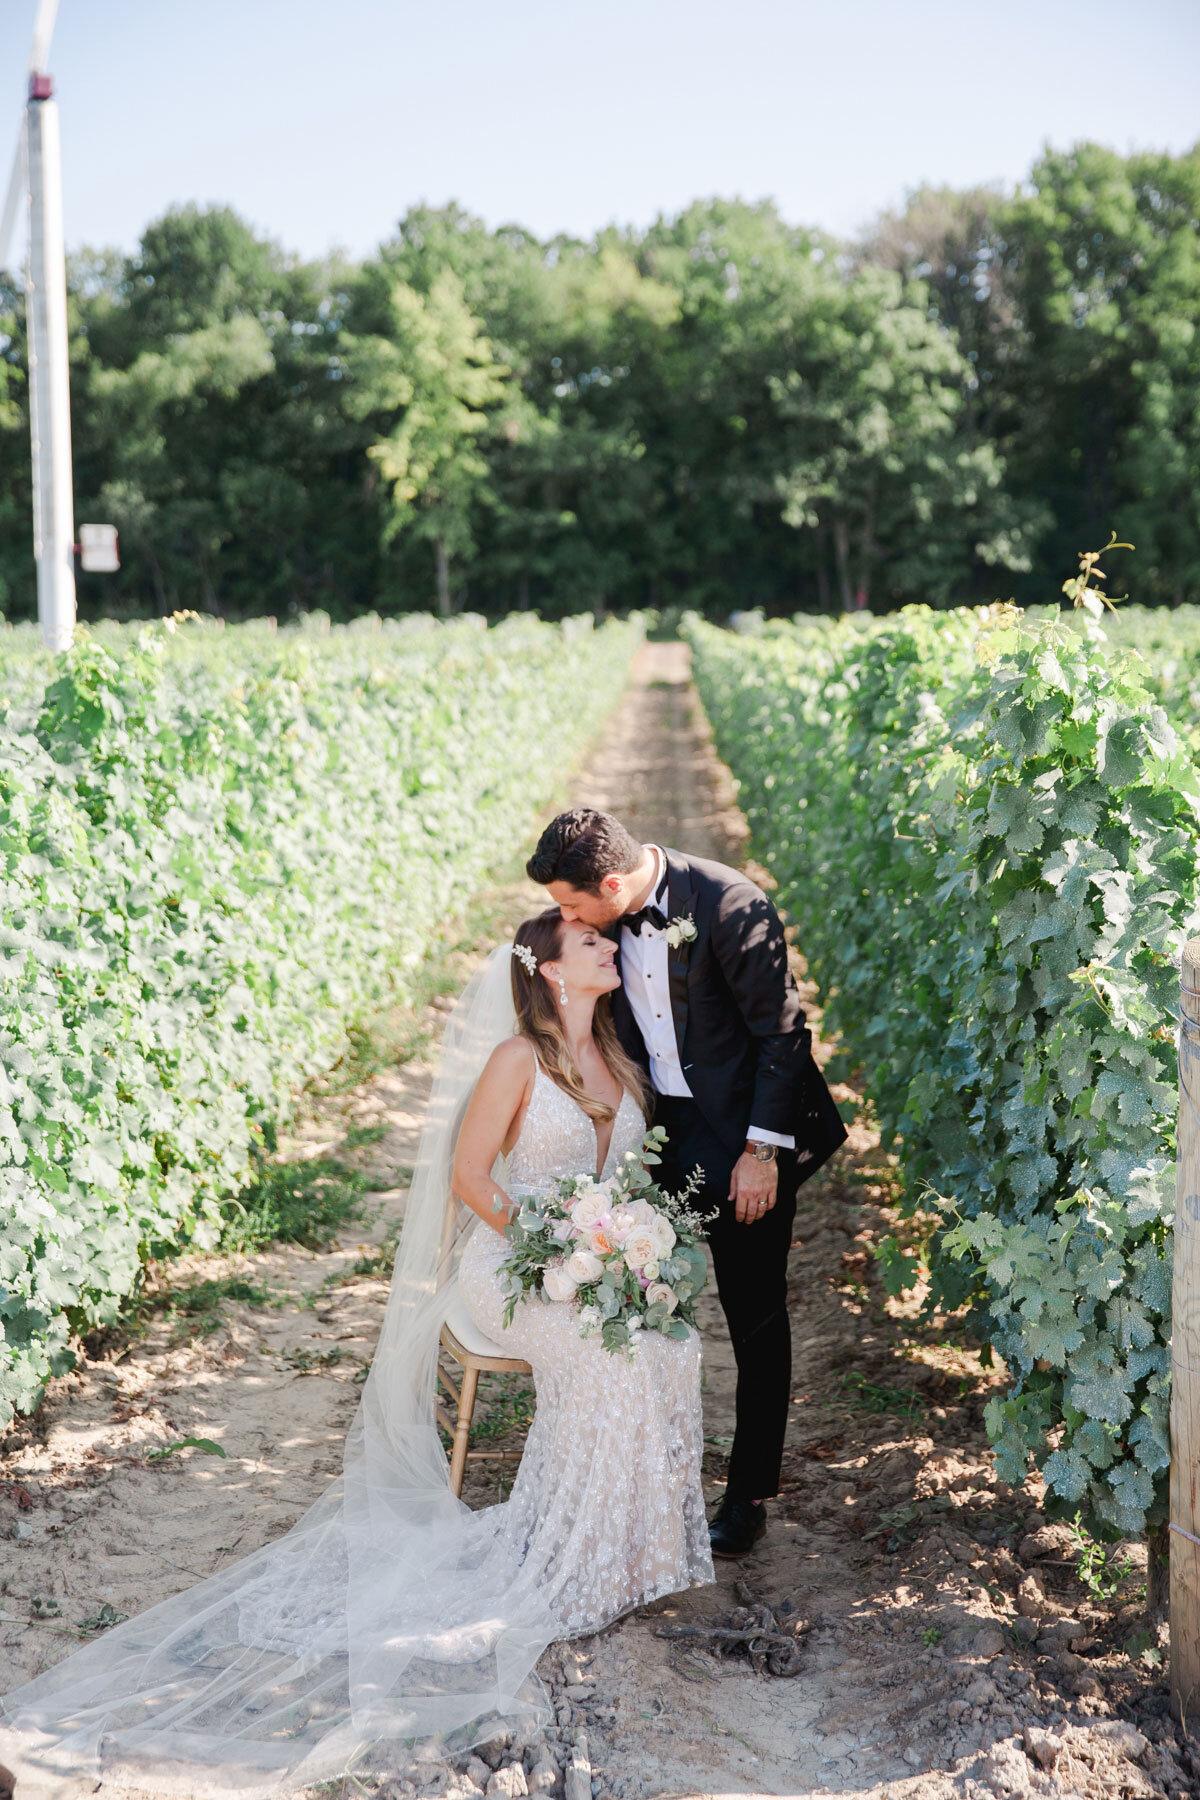 Chateau-des-Charmes-Wedding-Summer-Vineyard-Bride-Niagara-on-the-Lake-photos-by-Gemini-Photography-Ontario-0041.jpg